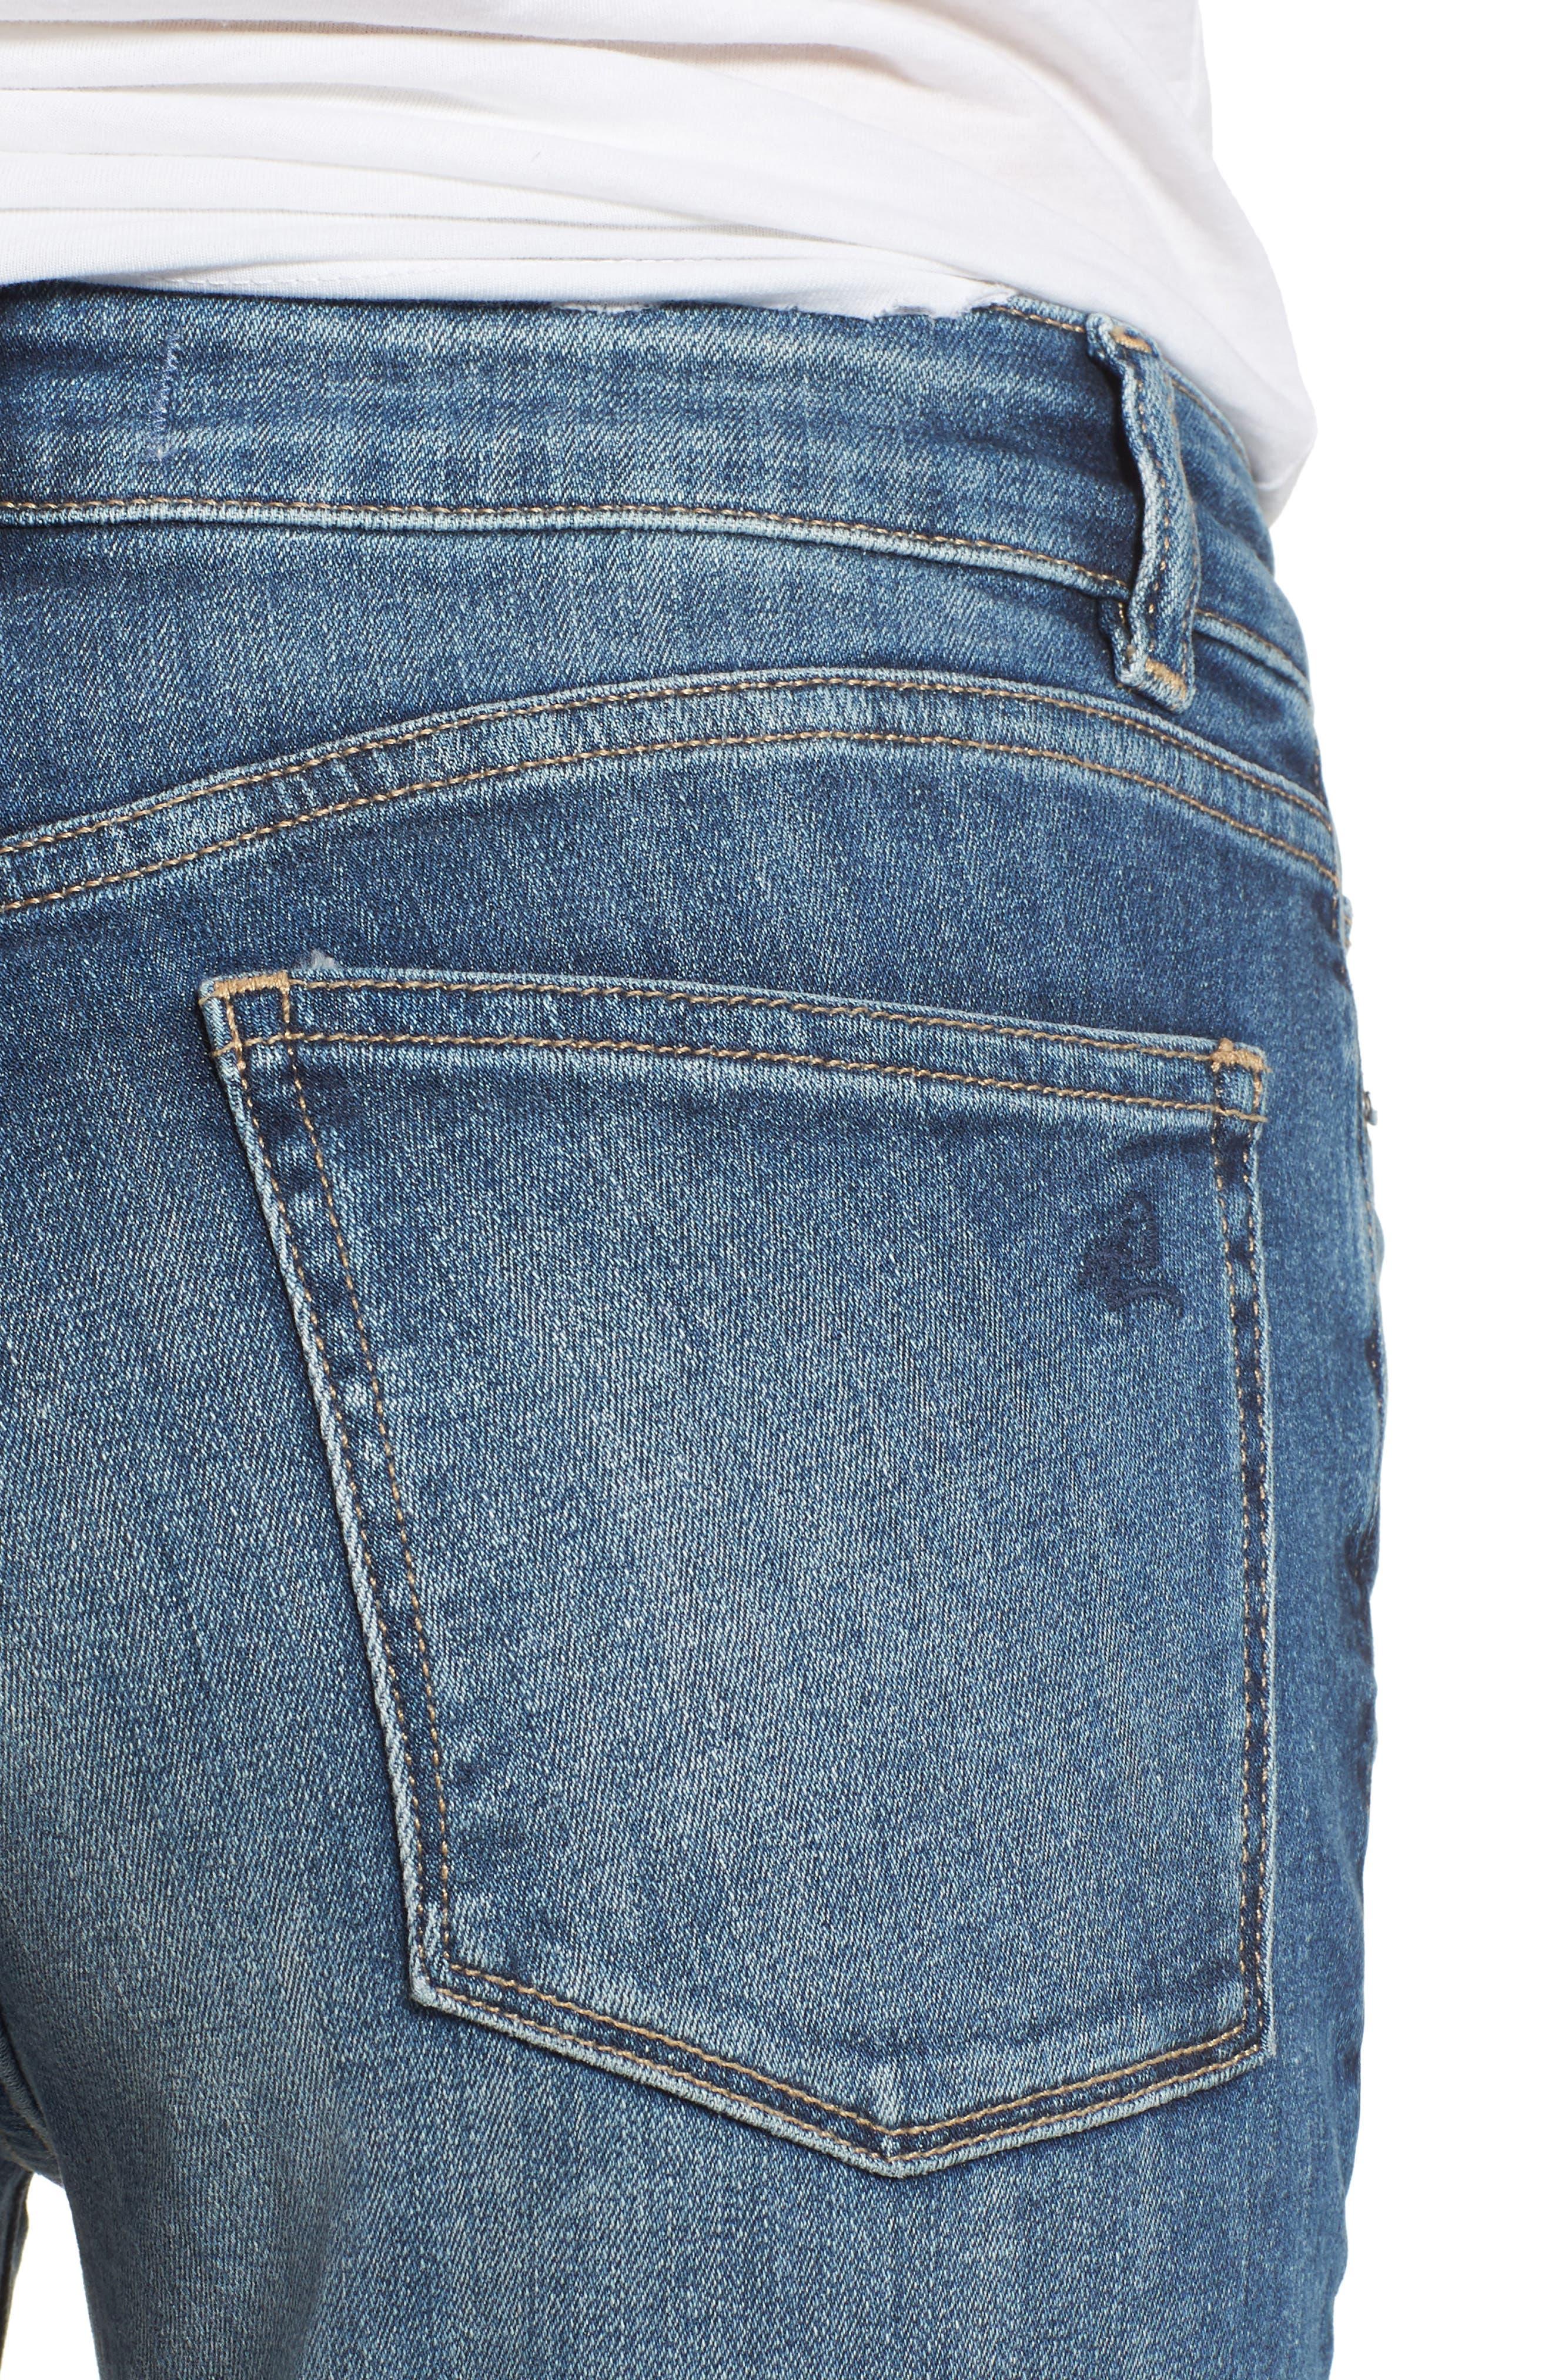 Farrow Instaslim High Waist Skinny Jeans,                             Alternate thumbnail 4, color,                             Wells